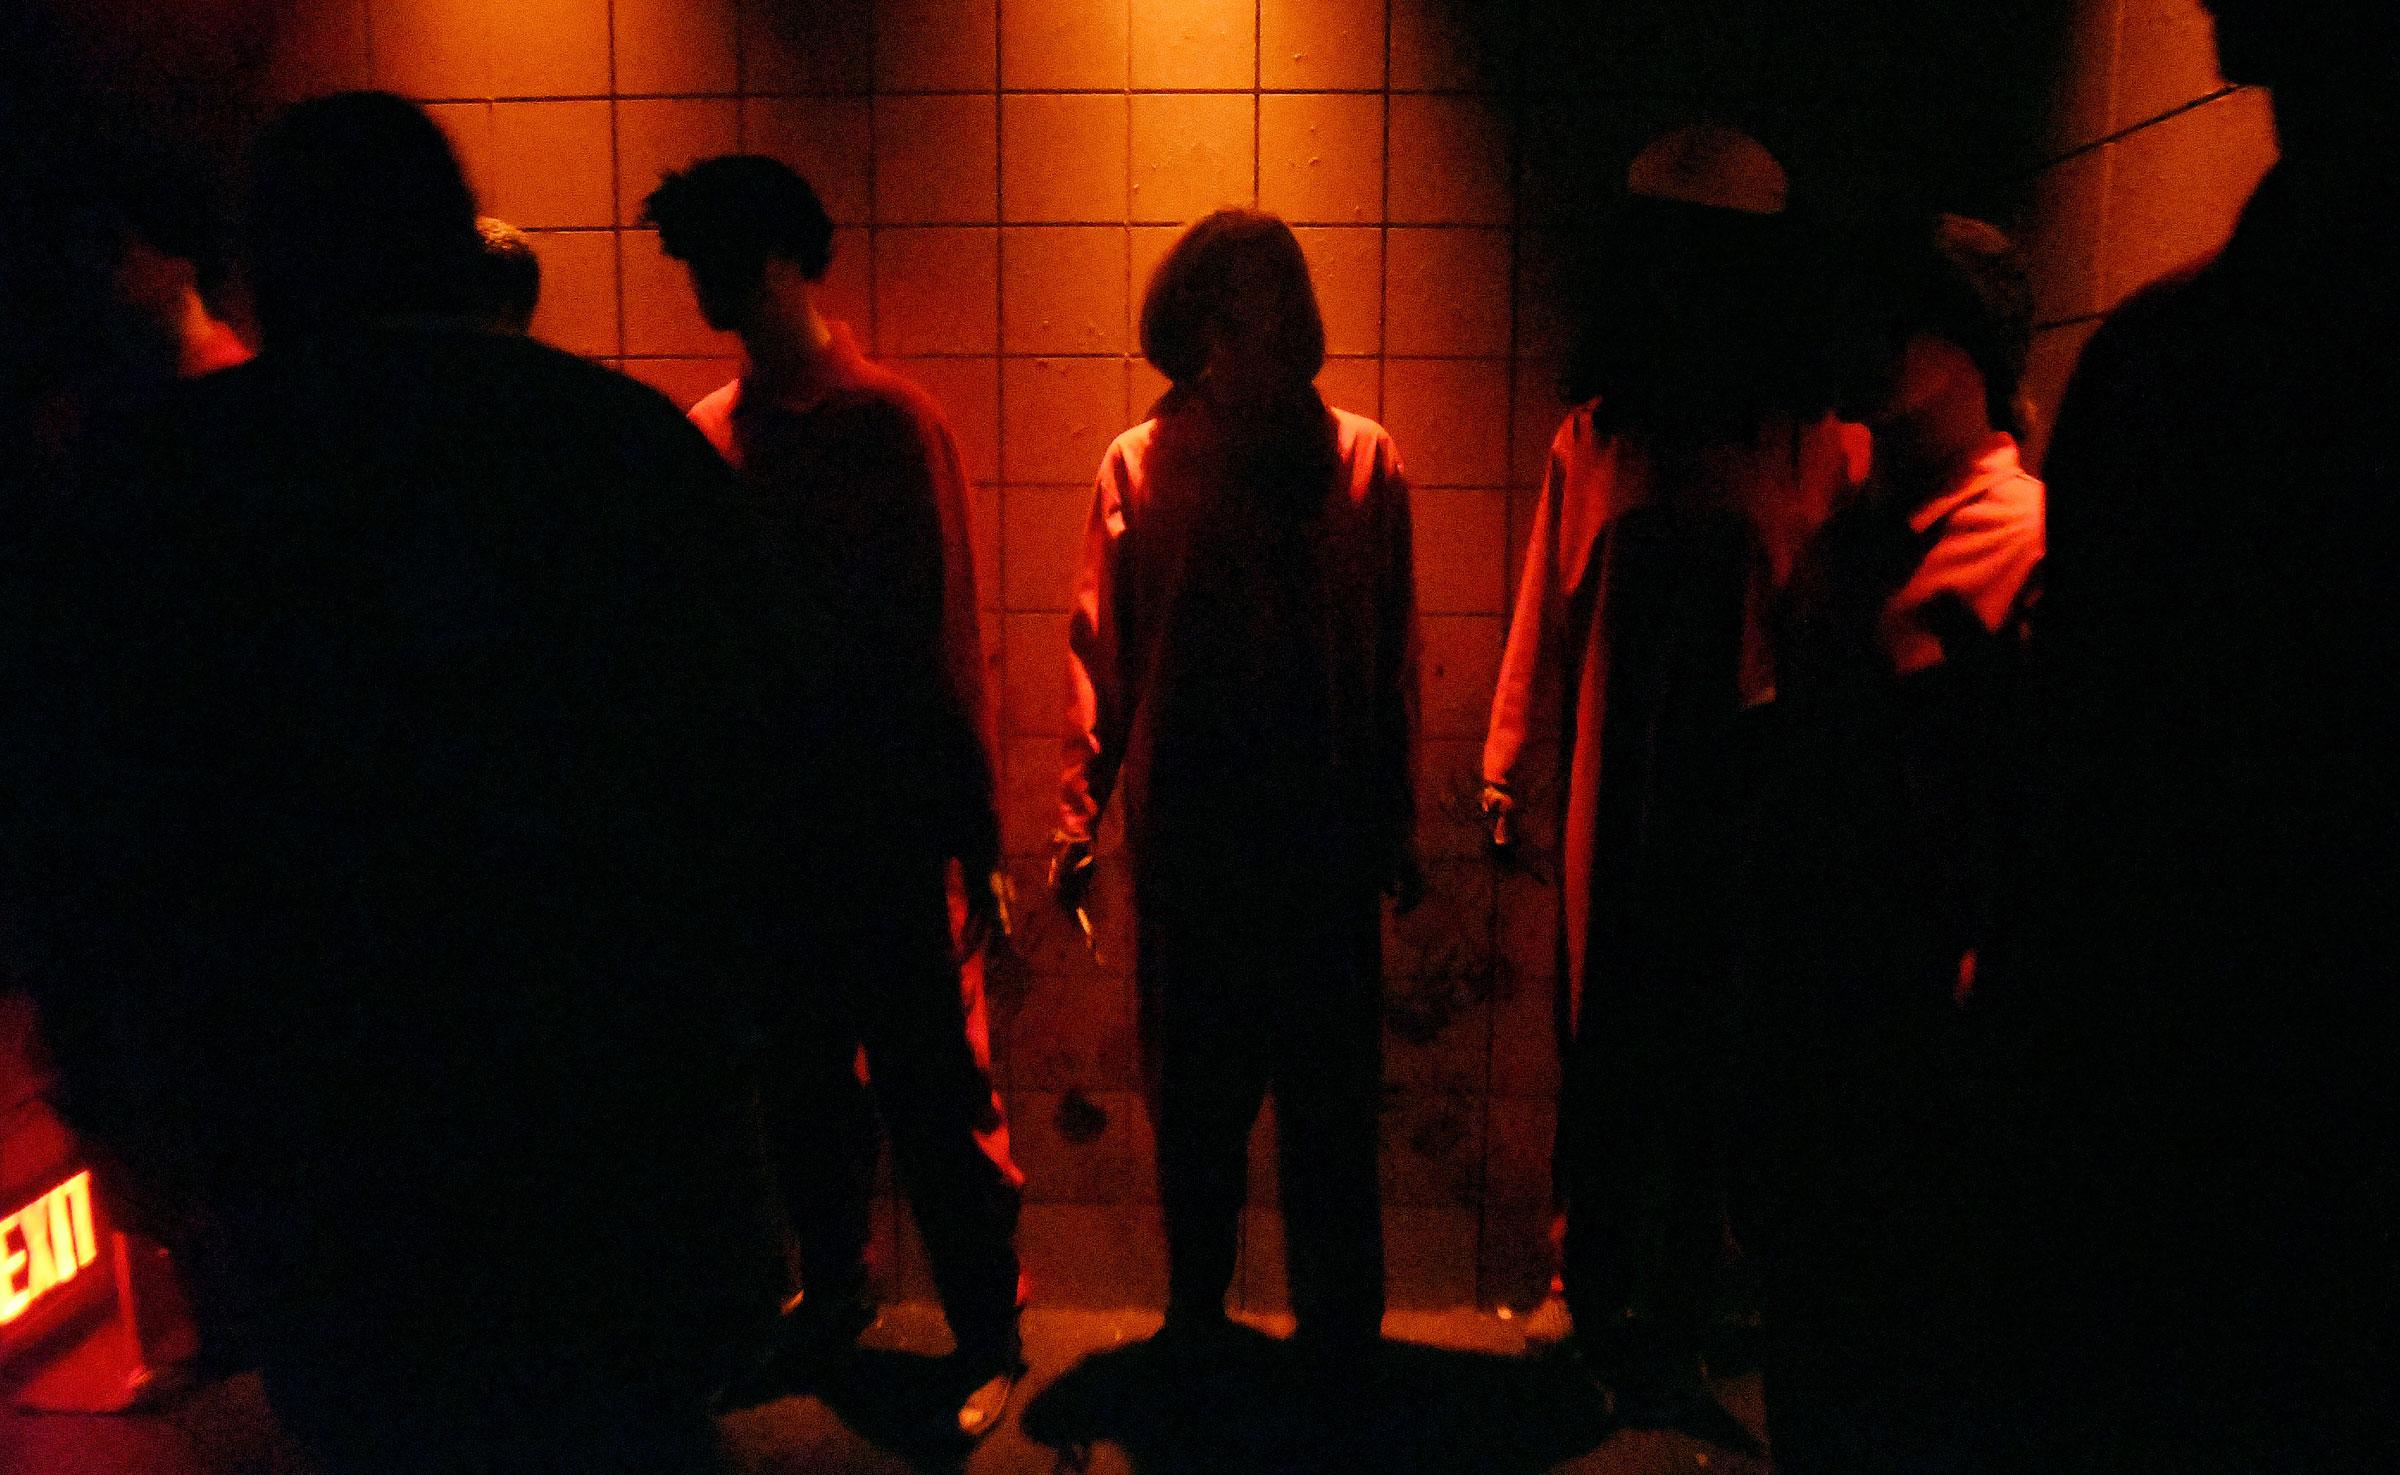 A look inside last year's Halloween Horror Nights in Orlando.